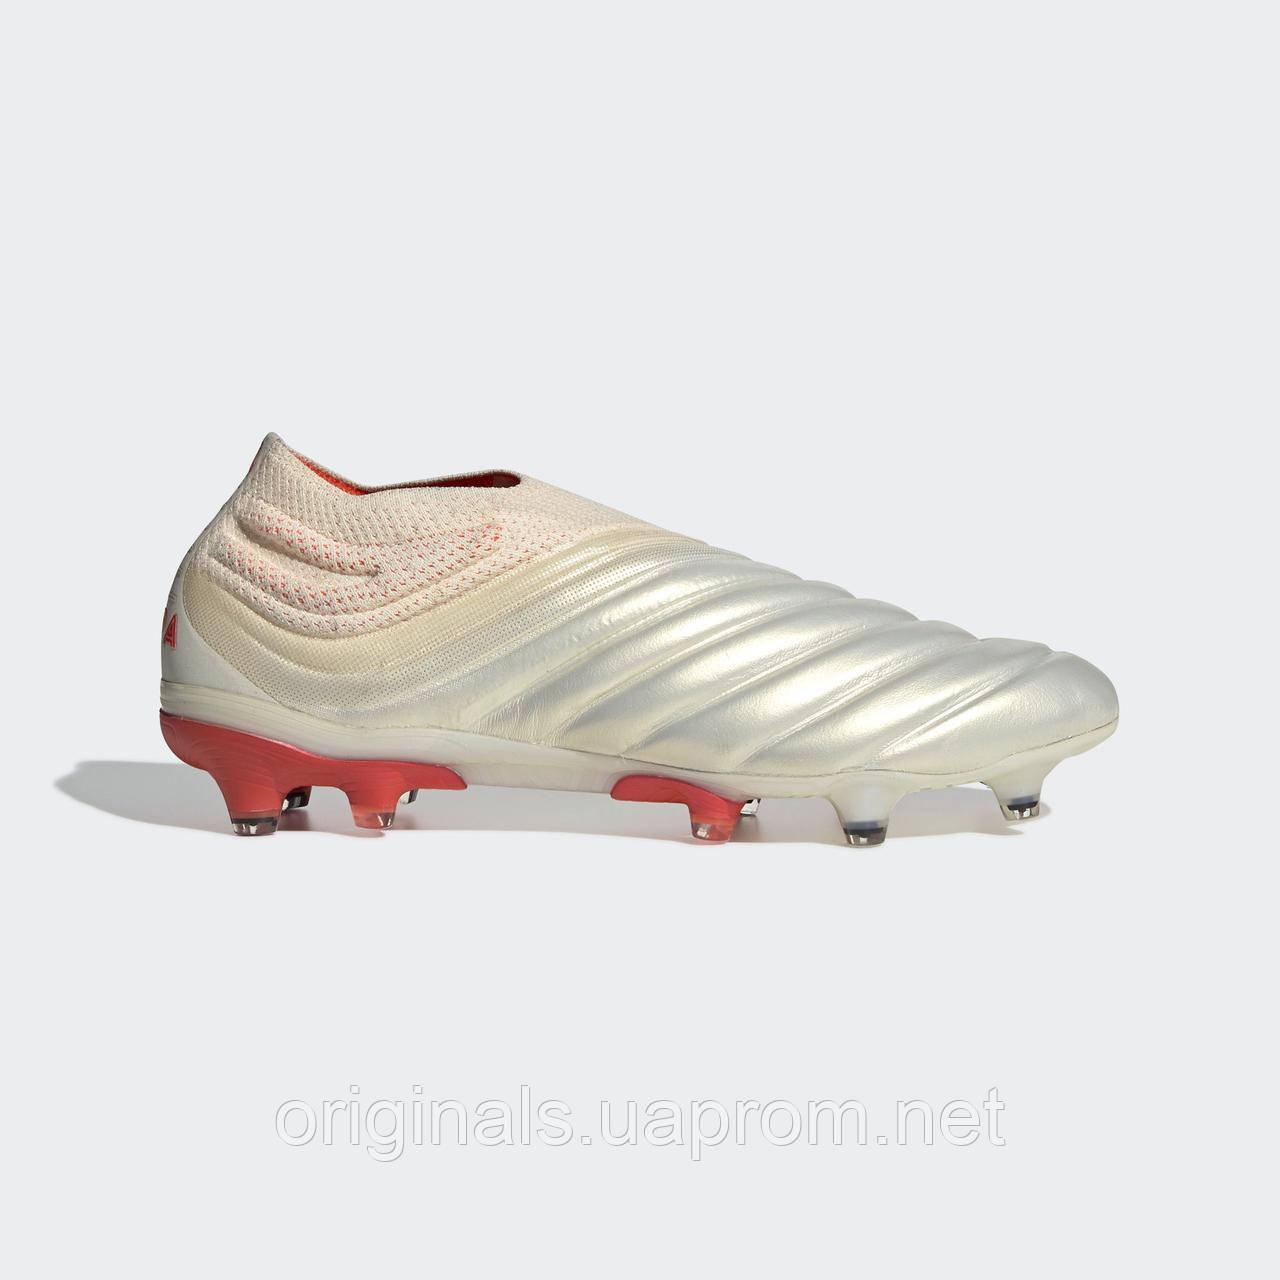 bfbc9c54 Футбольные бутсы Adidas Copa 19+ FG BB9163 - 2018/2, цена 5 943 грн ...